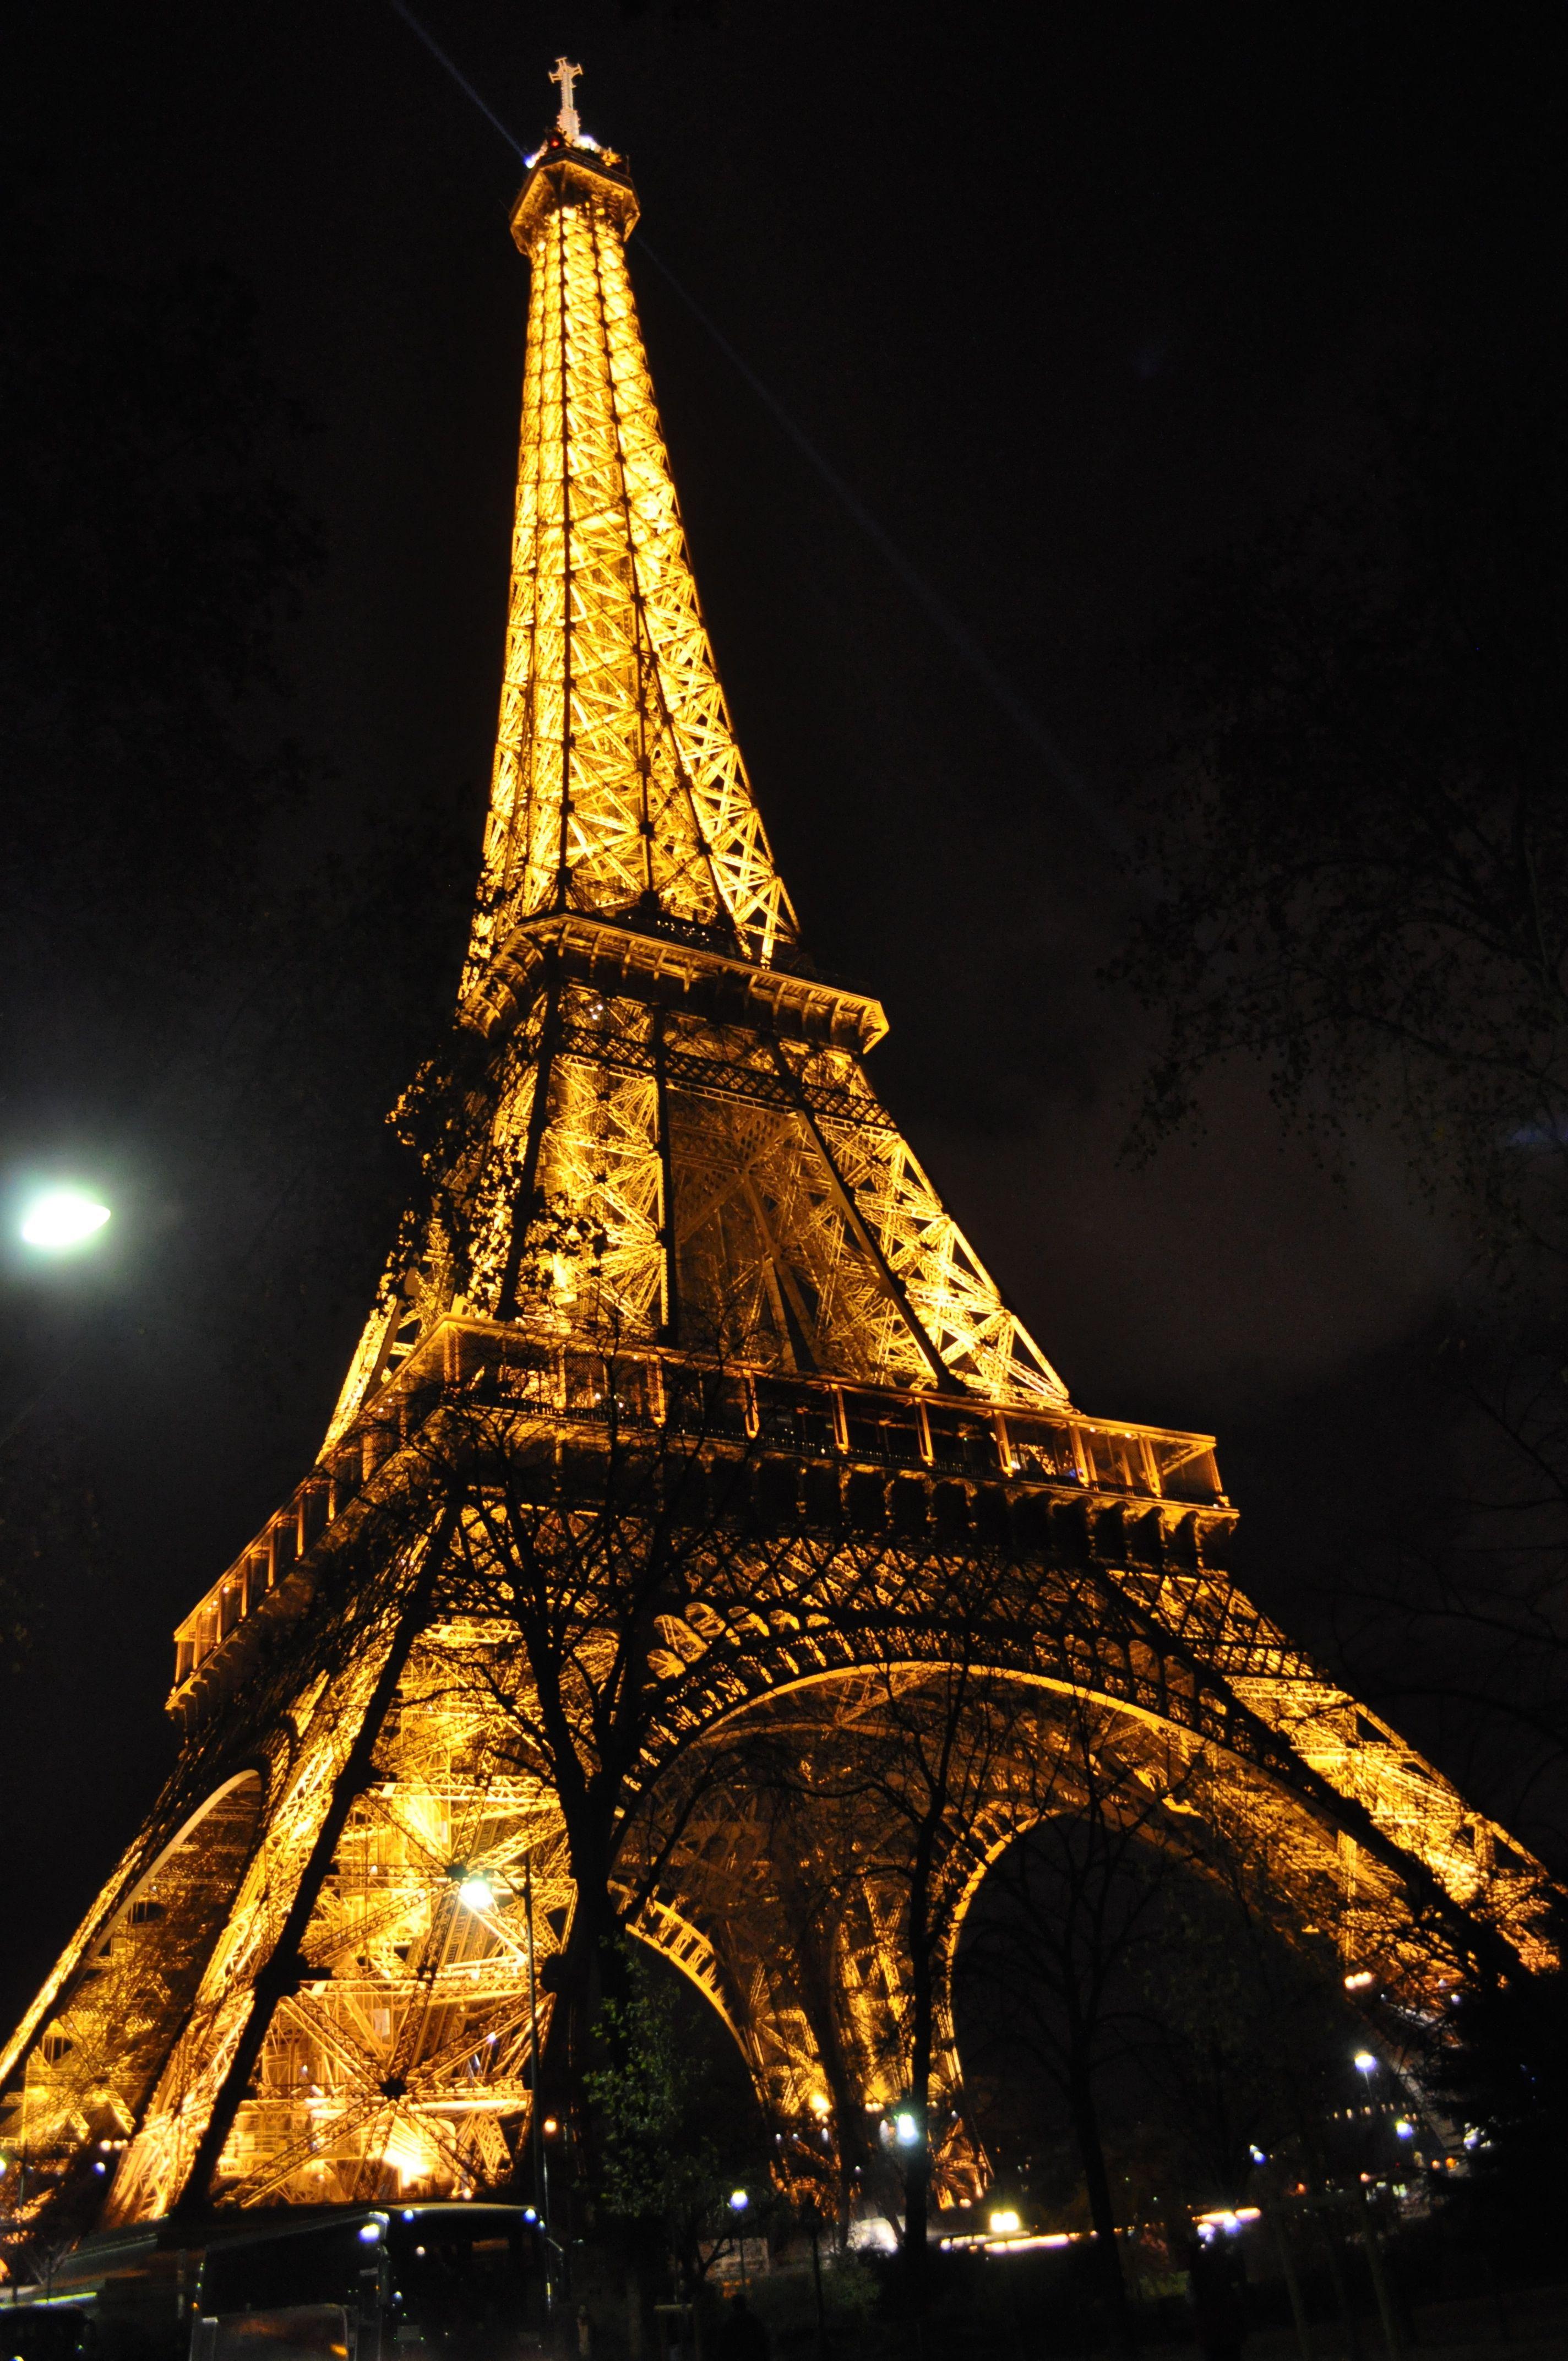 Eiffel tower at night eiffel tower at night eiffel